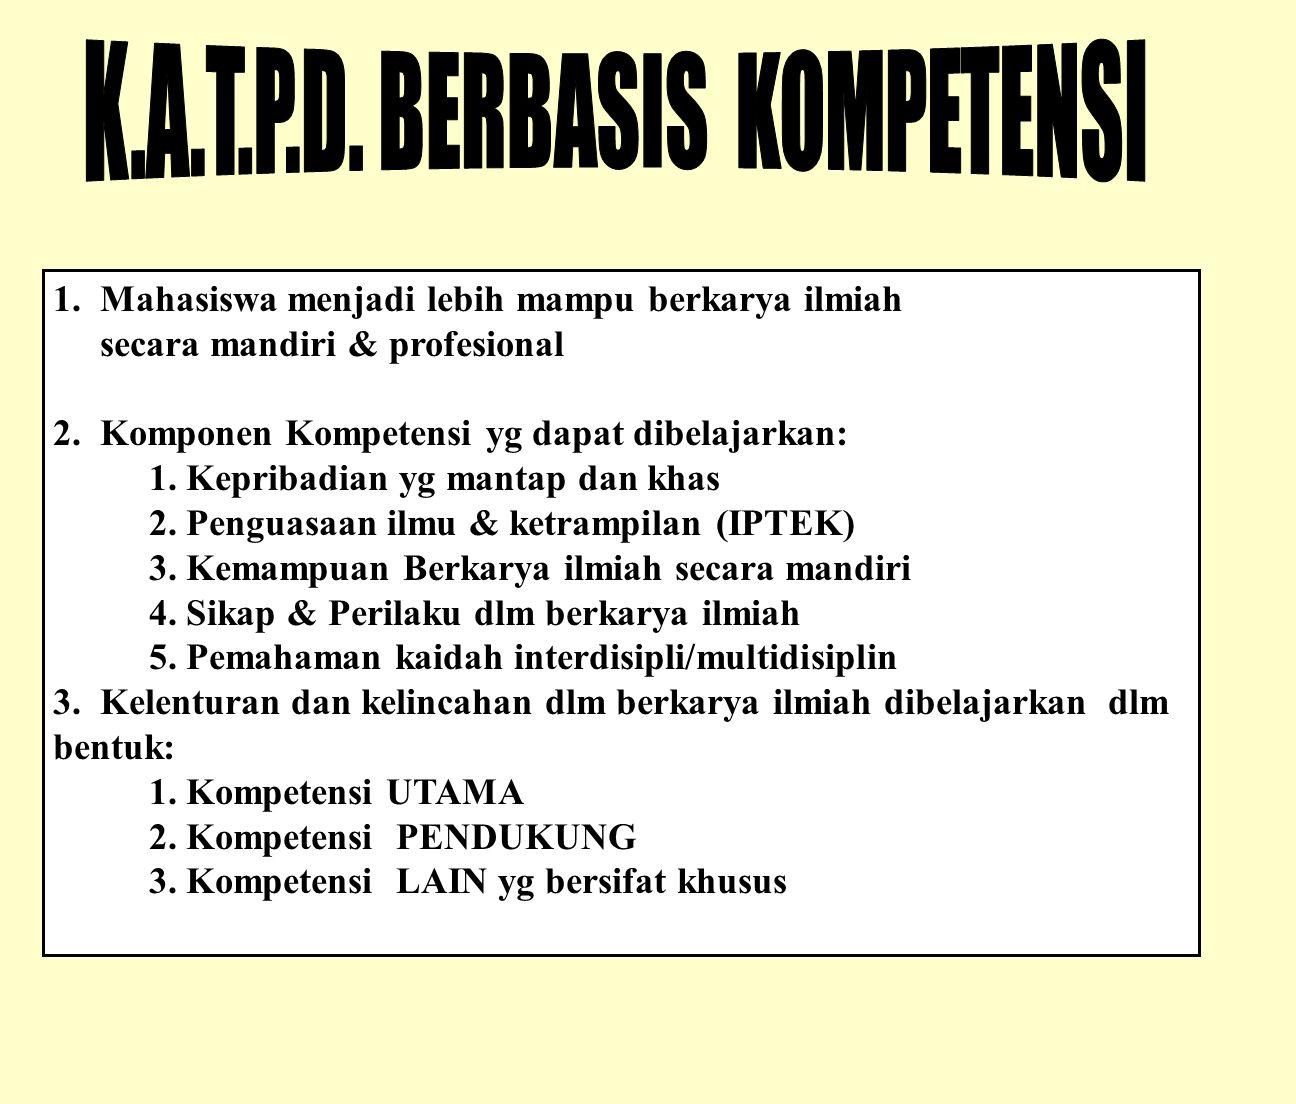 K.A.T.P.D. BERBASIS KOMPETENSI